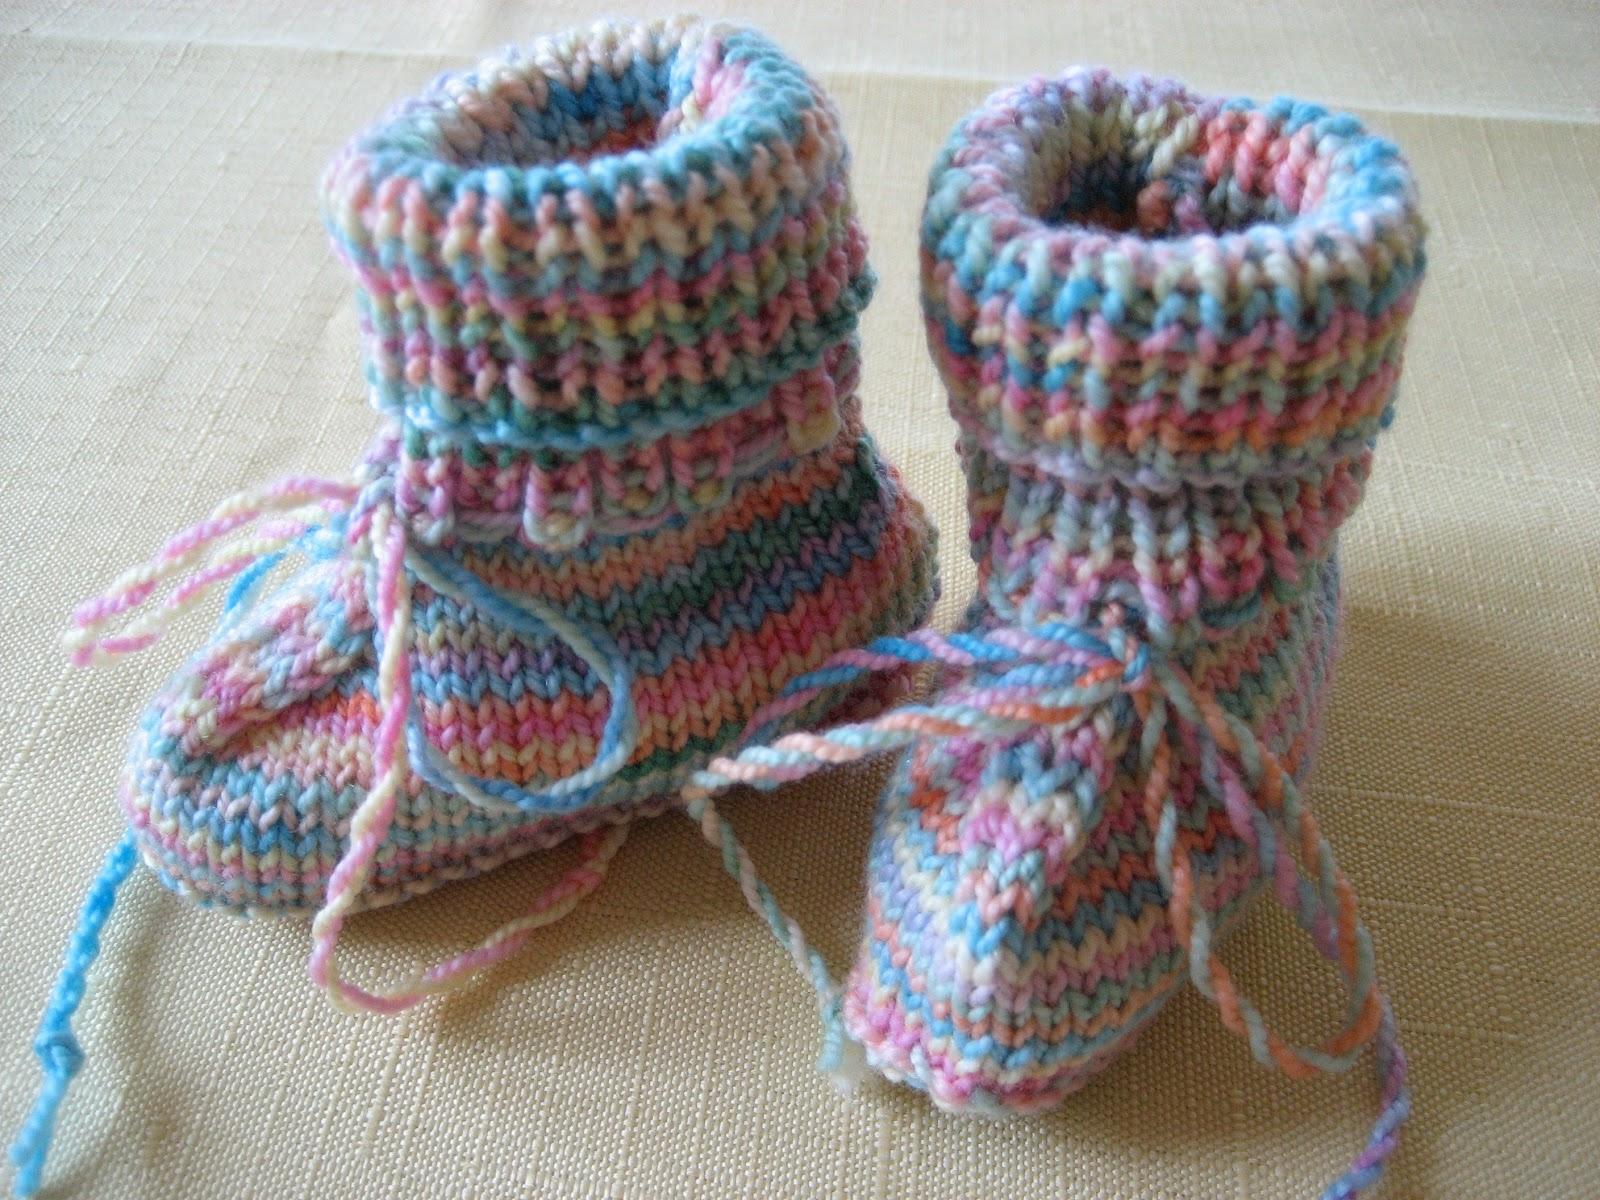 Red Hat Knitter: I\'m Still Buying Yarn and Knitting